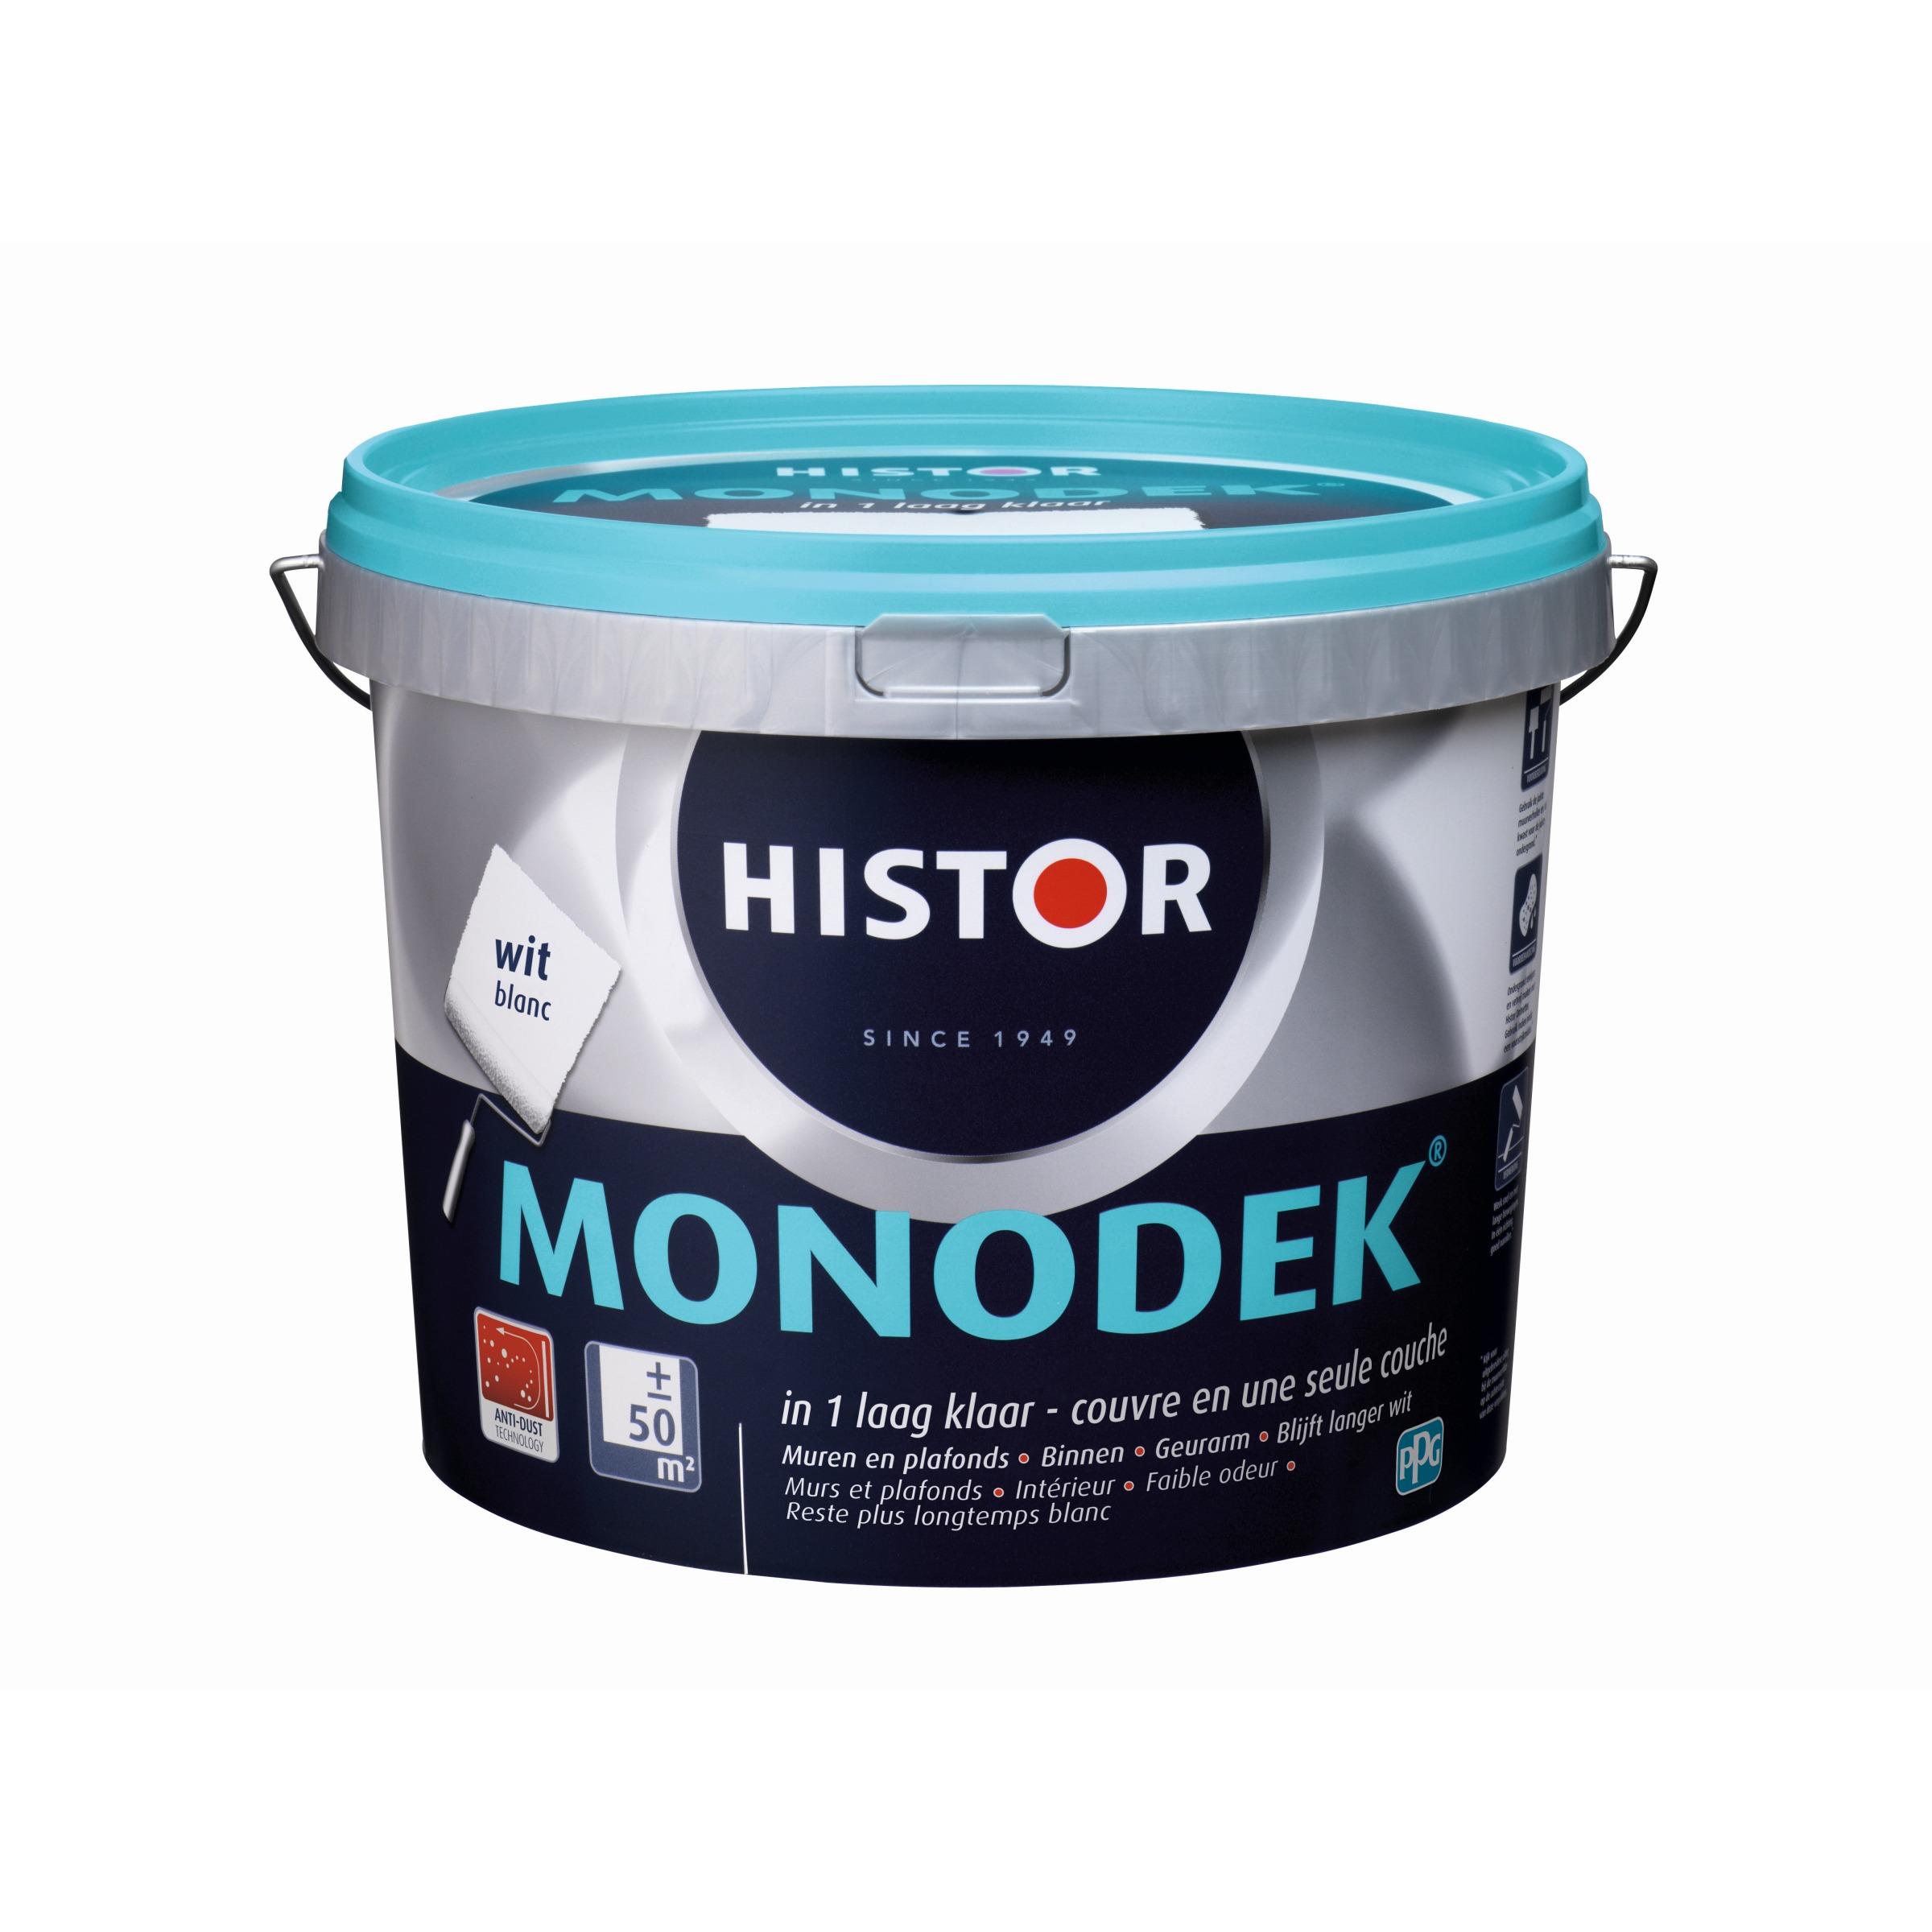 Histor Monodek Muurverf 5 liter